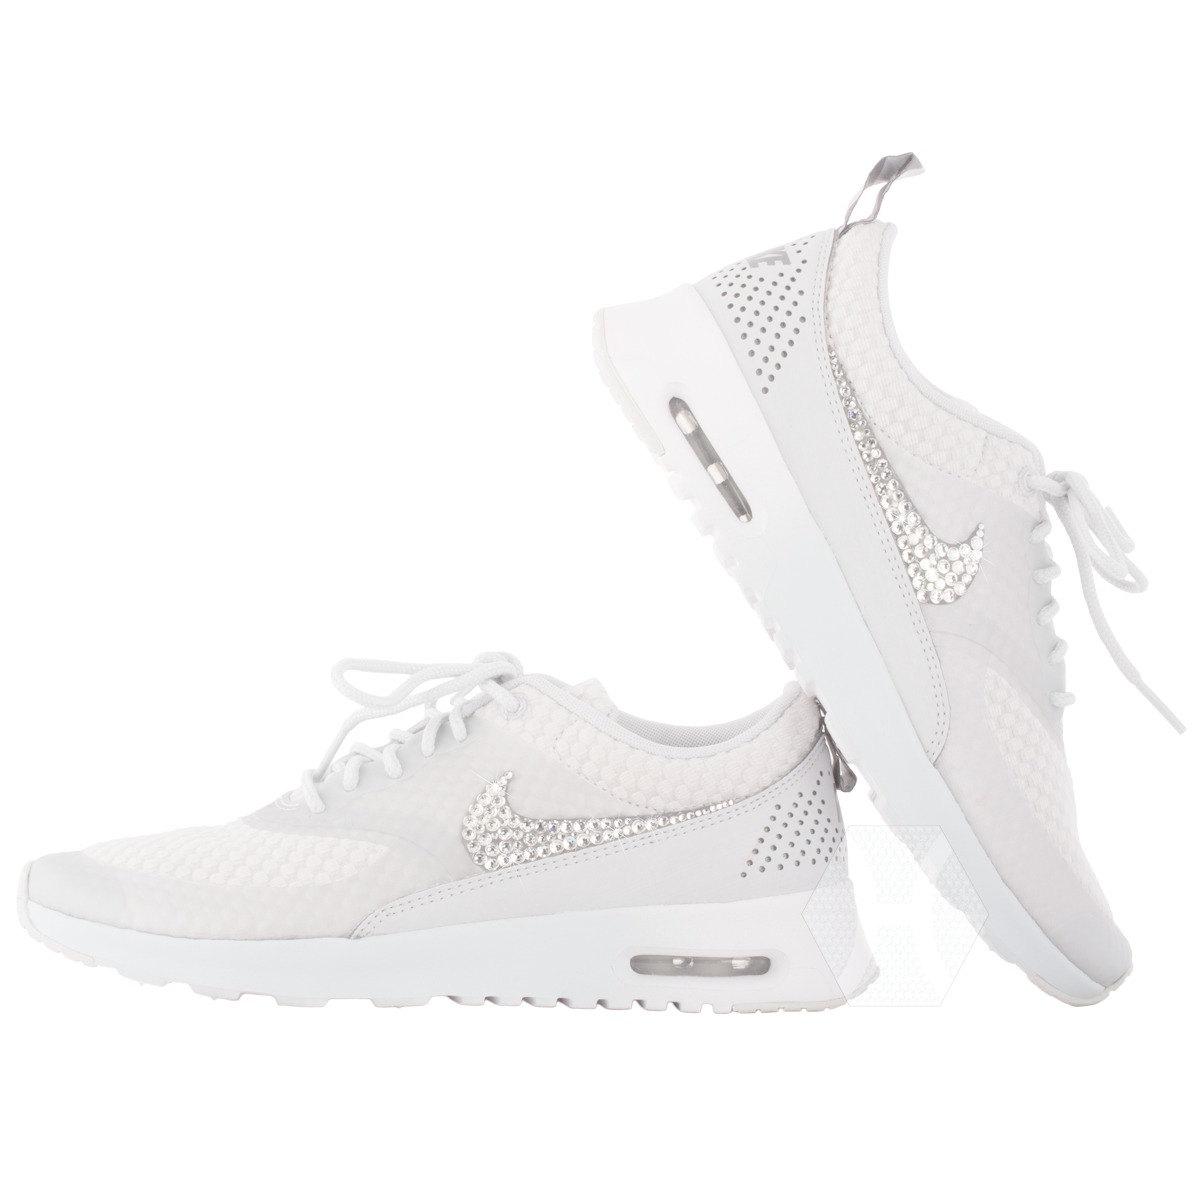 reputable site cd268 ac5e1 Women's Nike Air Max Thea Premium in Light Base Grey/Cool Grey ...